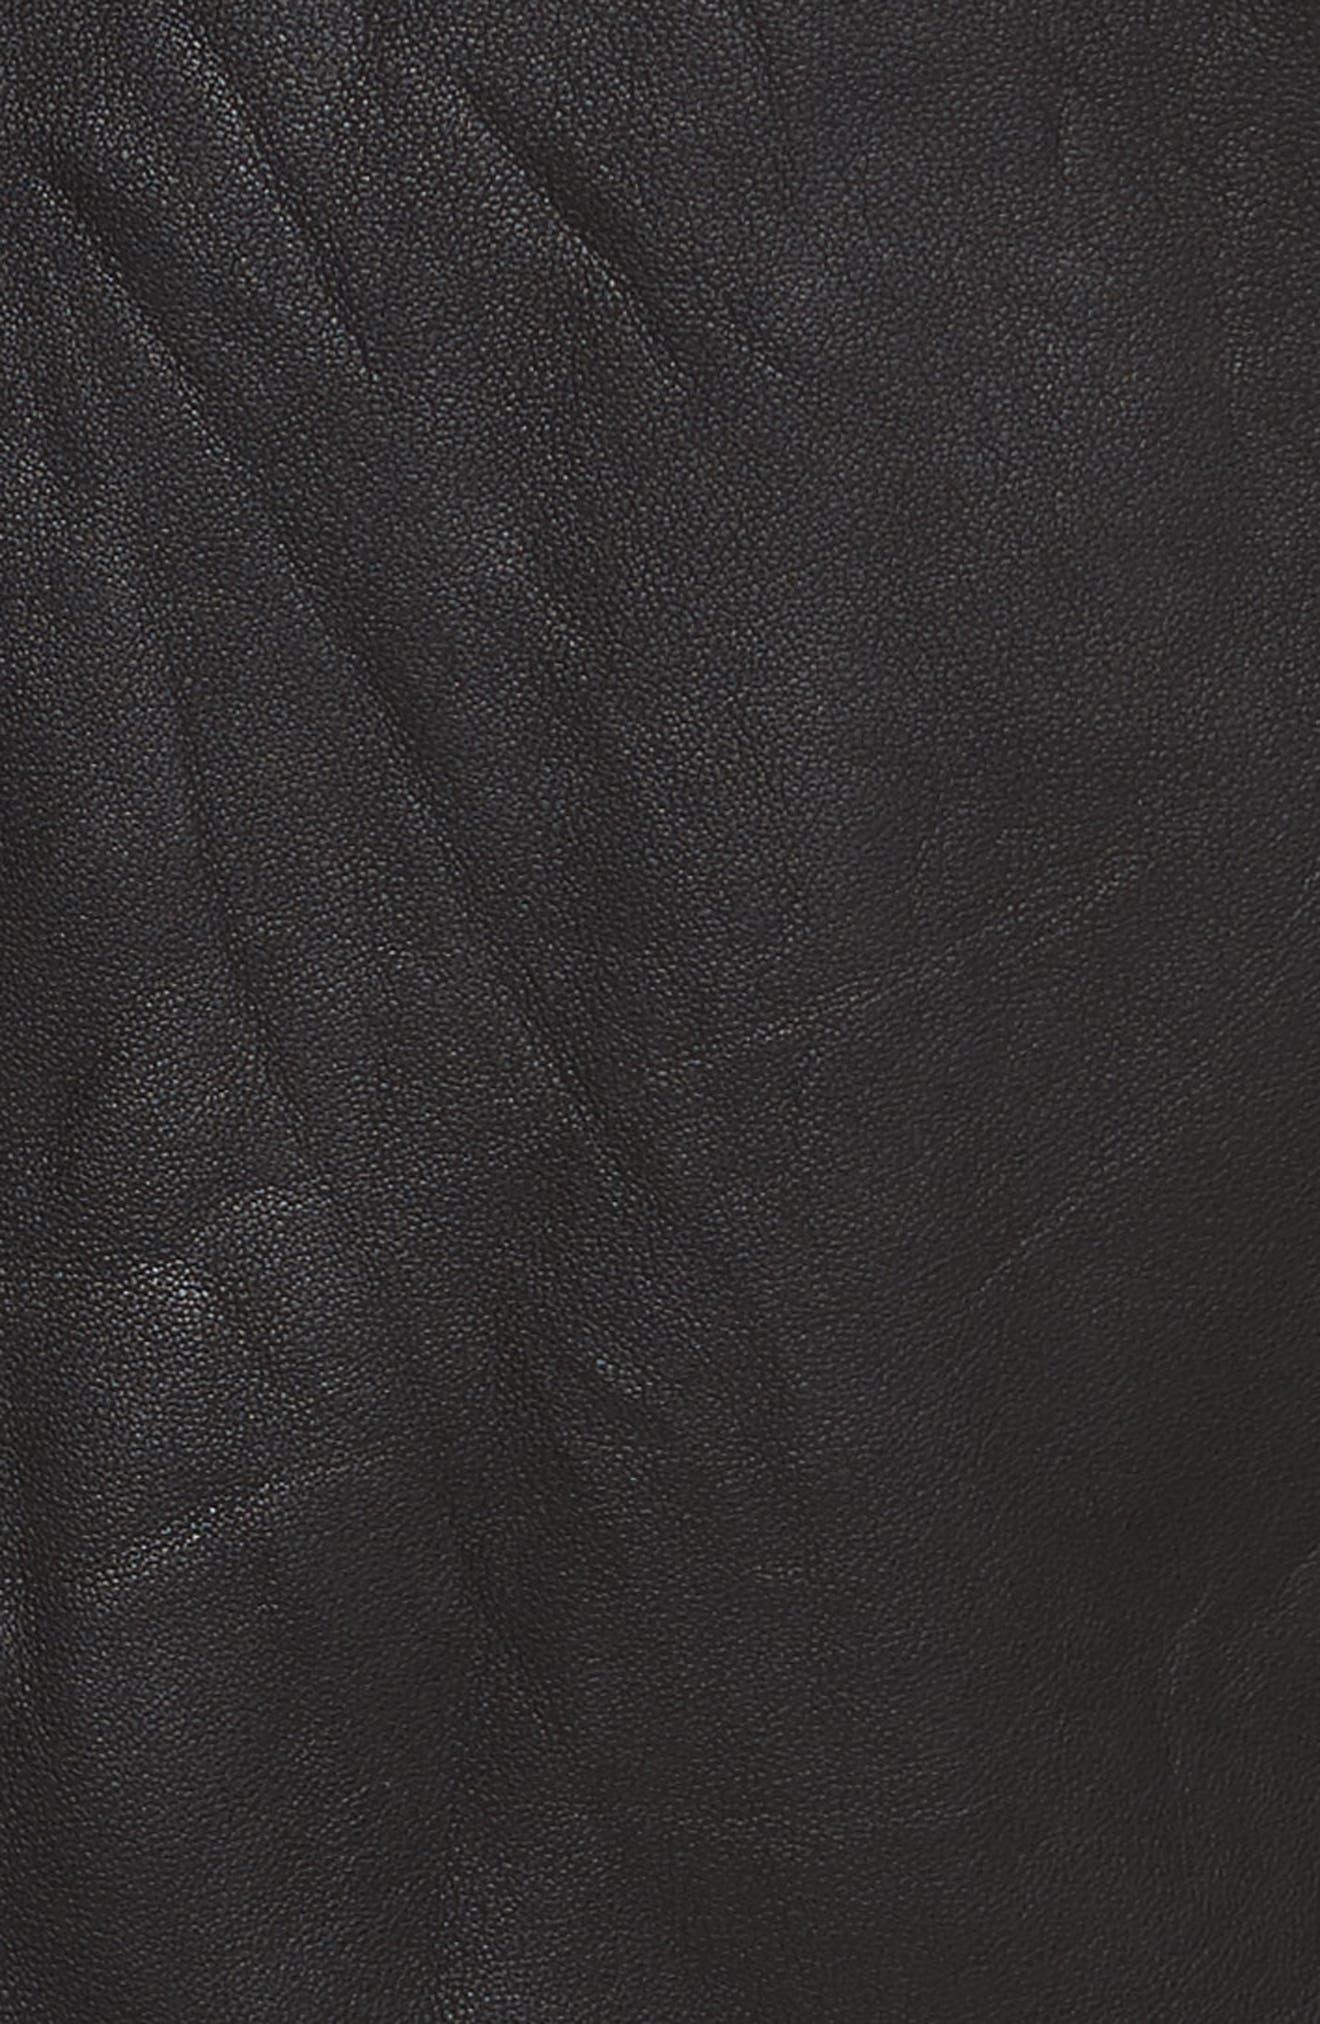 Cross Front Leather Jacket,                             Alternate thumbnail 5, color,                             Black